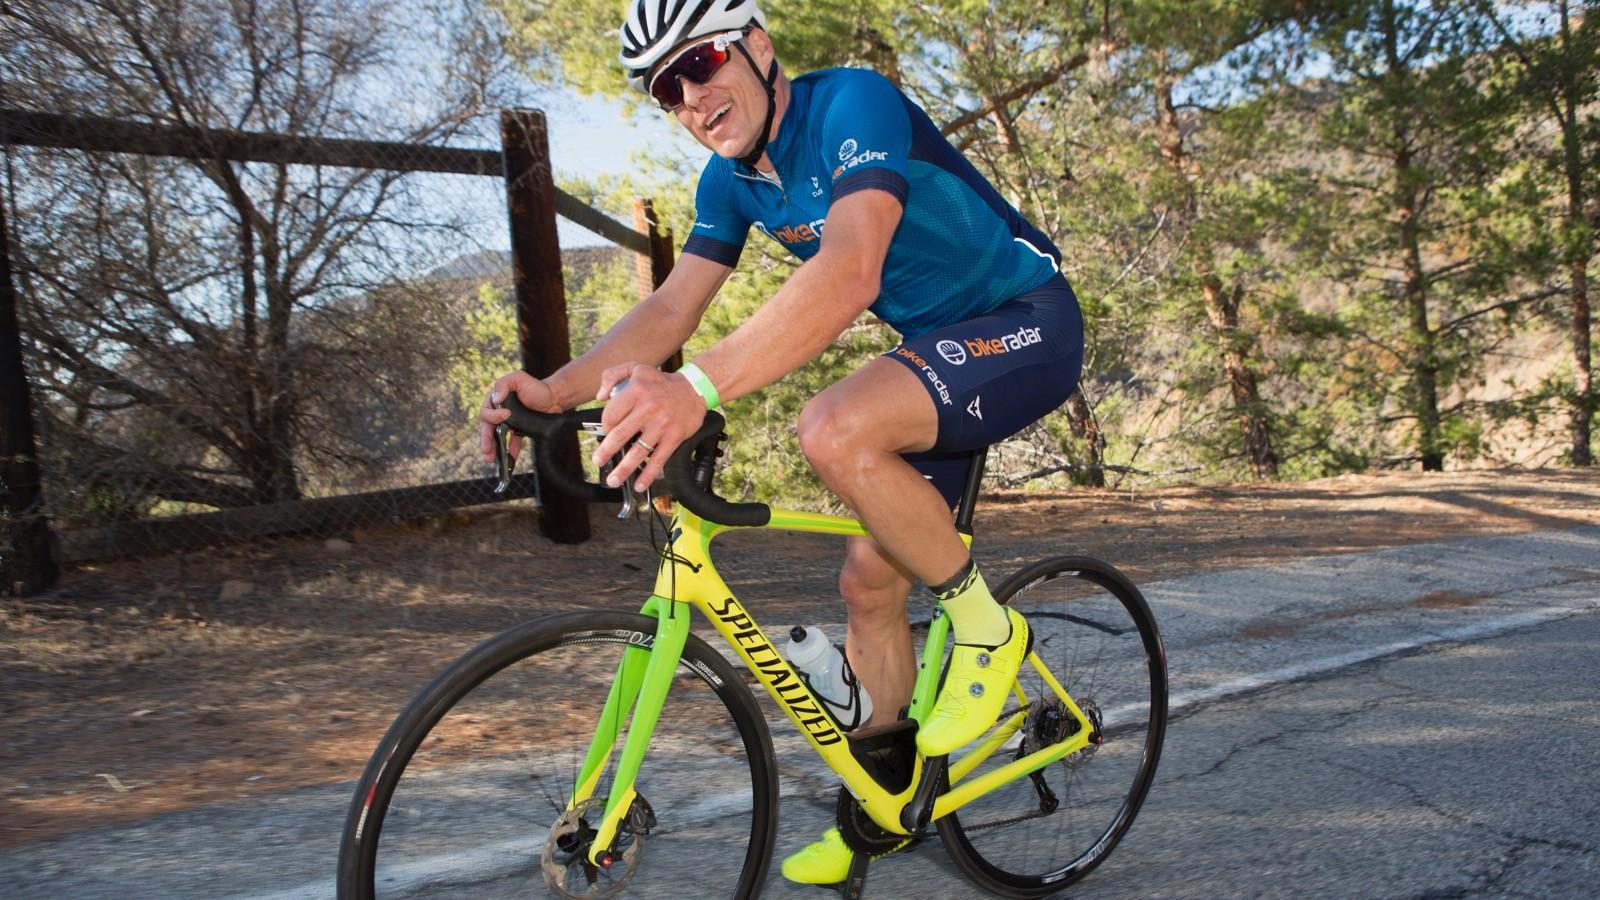 I rode the Specialized Roubaix Expert Ui2 at Peter Sagan's fundraiser gran fondo in California